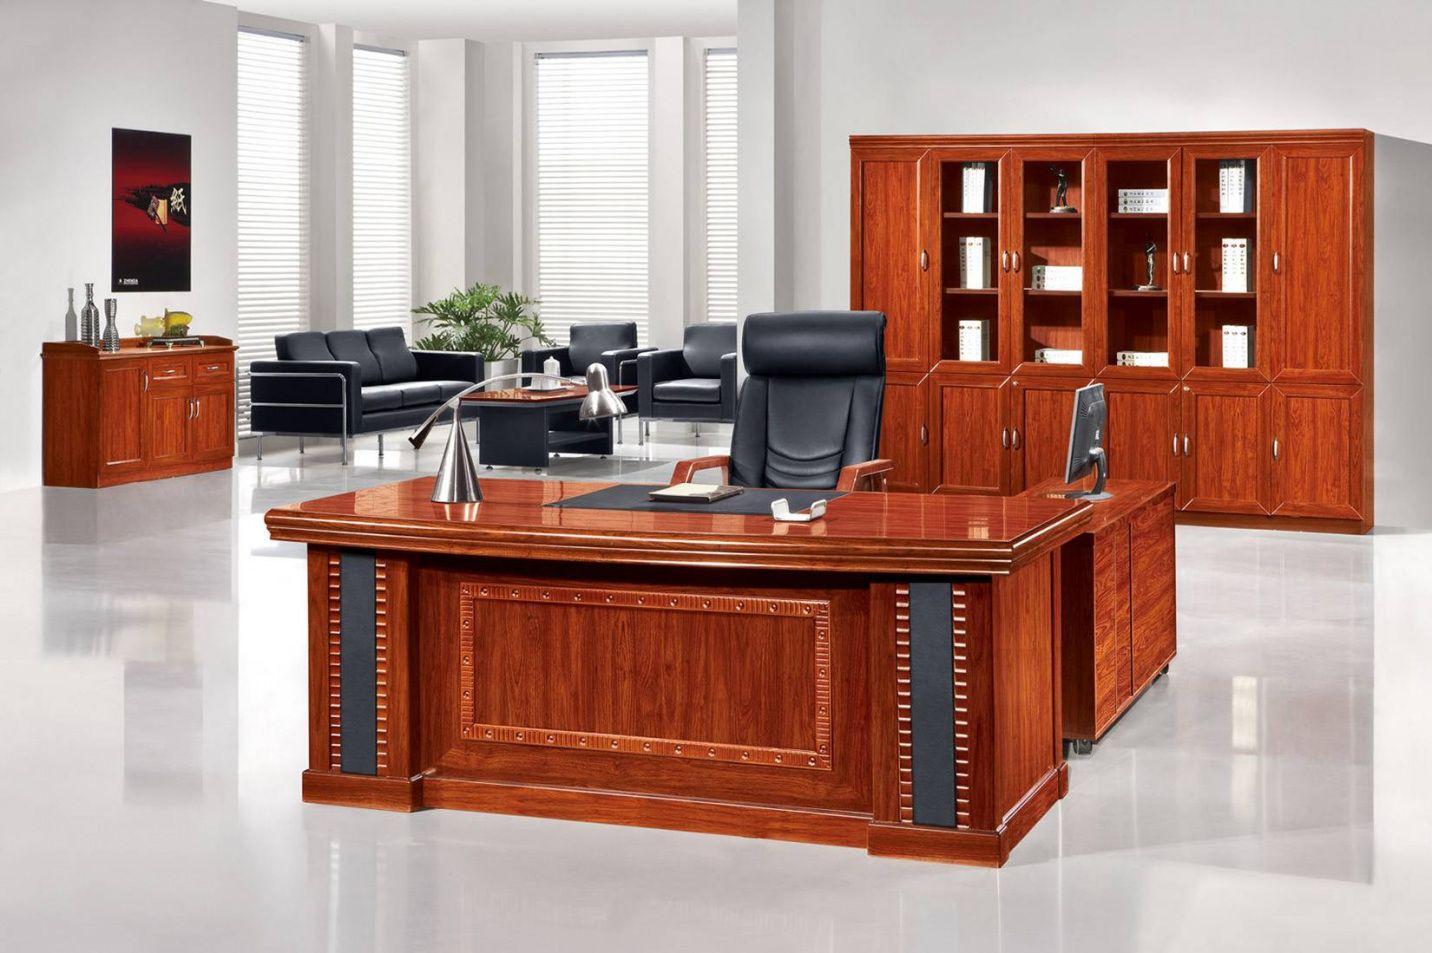 Office desks wood executive home office furniture check more at http michael malarkey com office desks wood